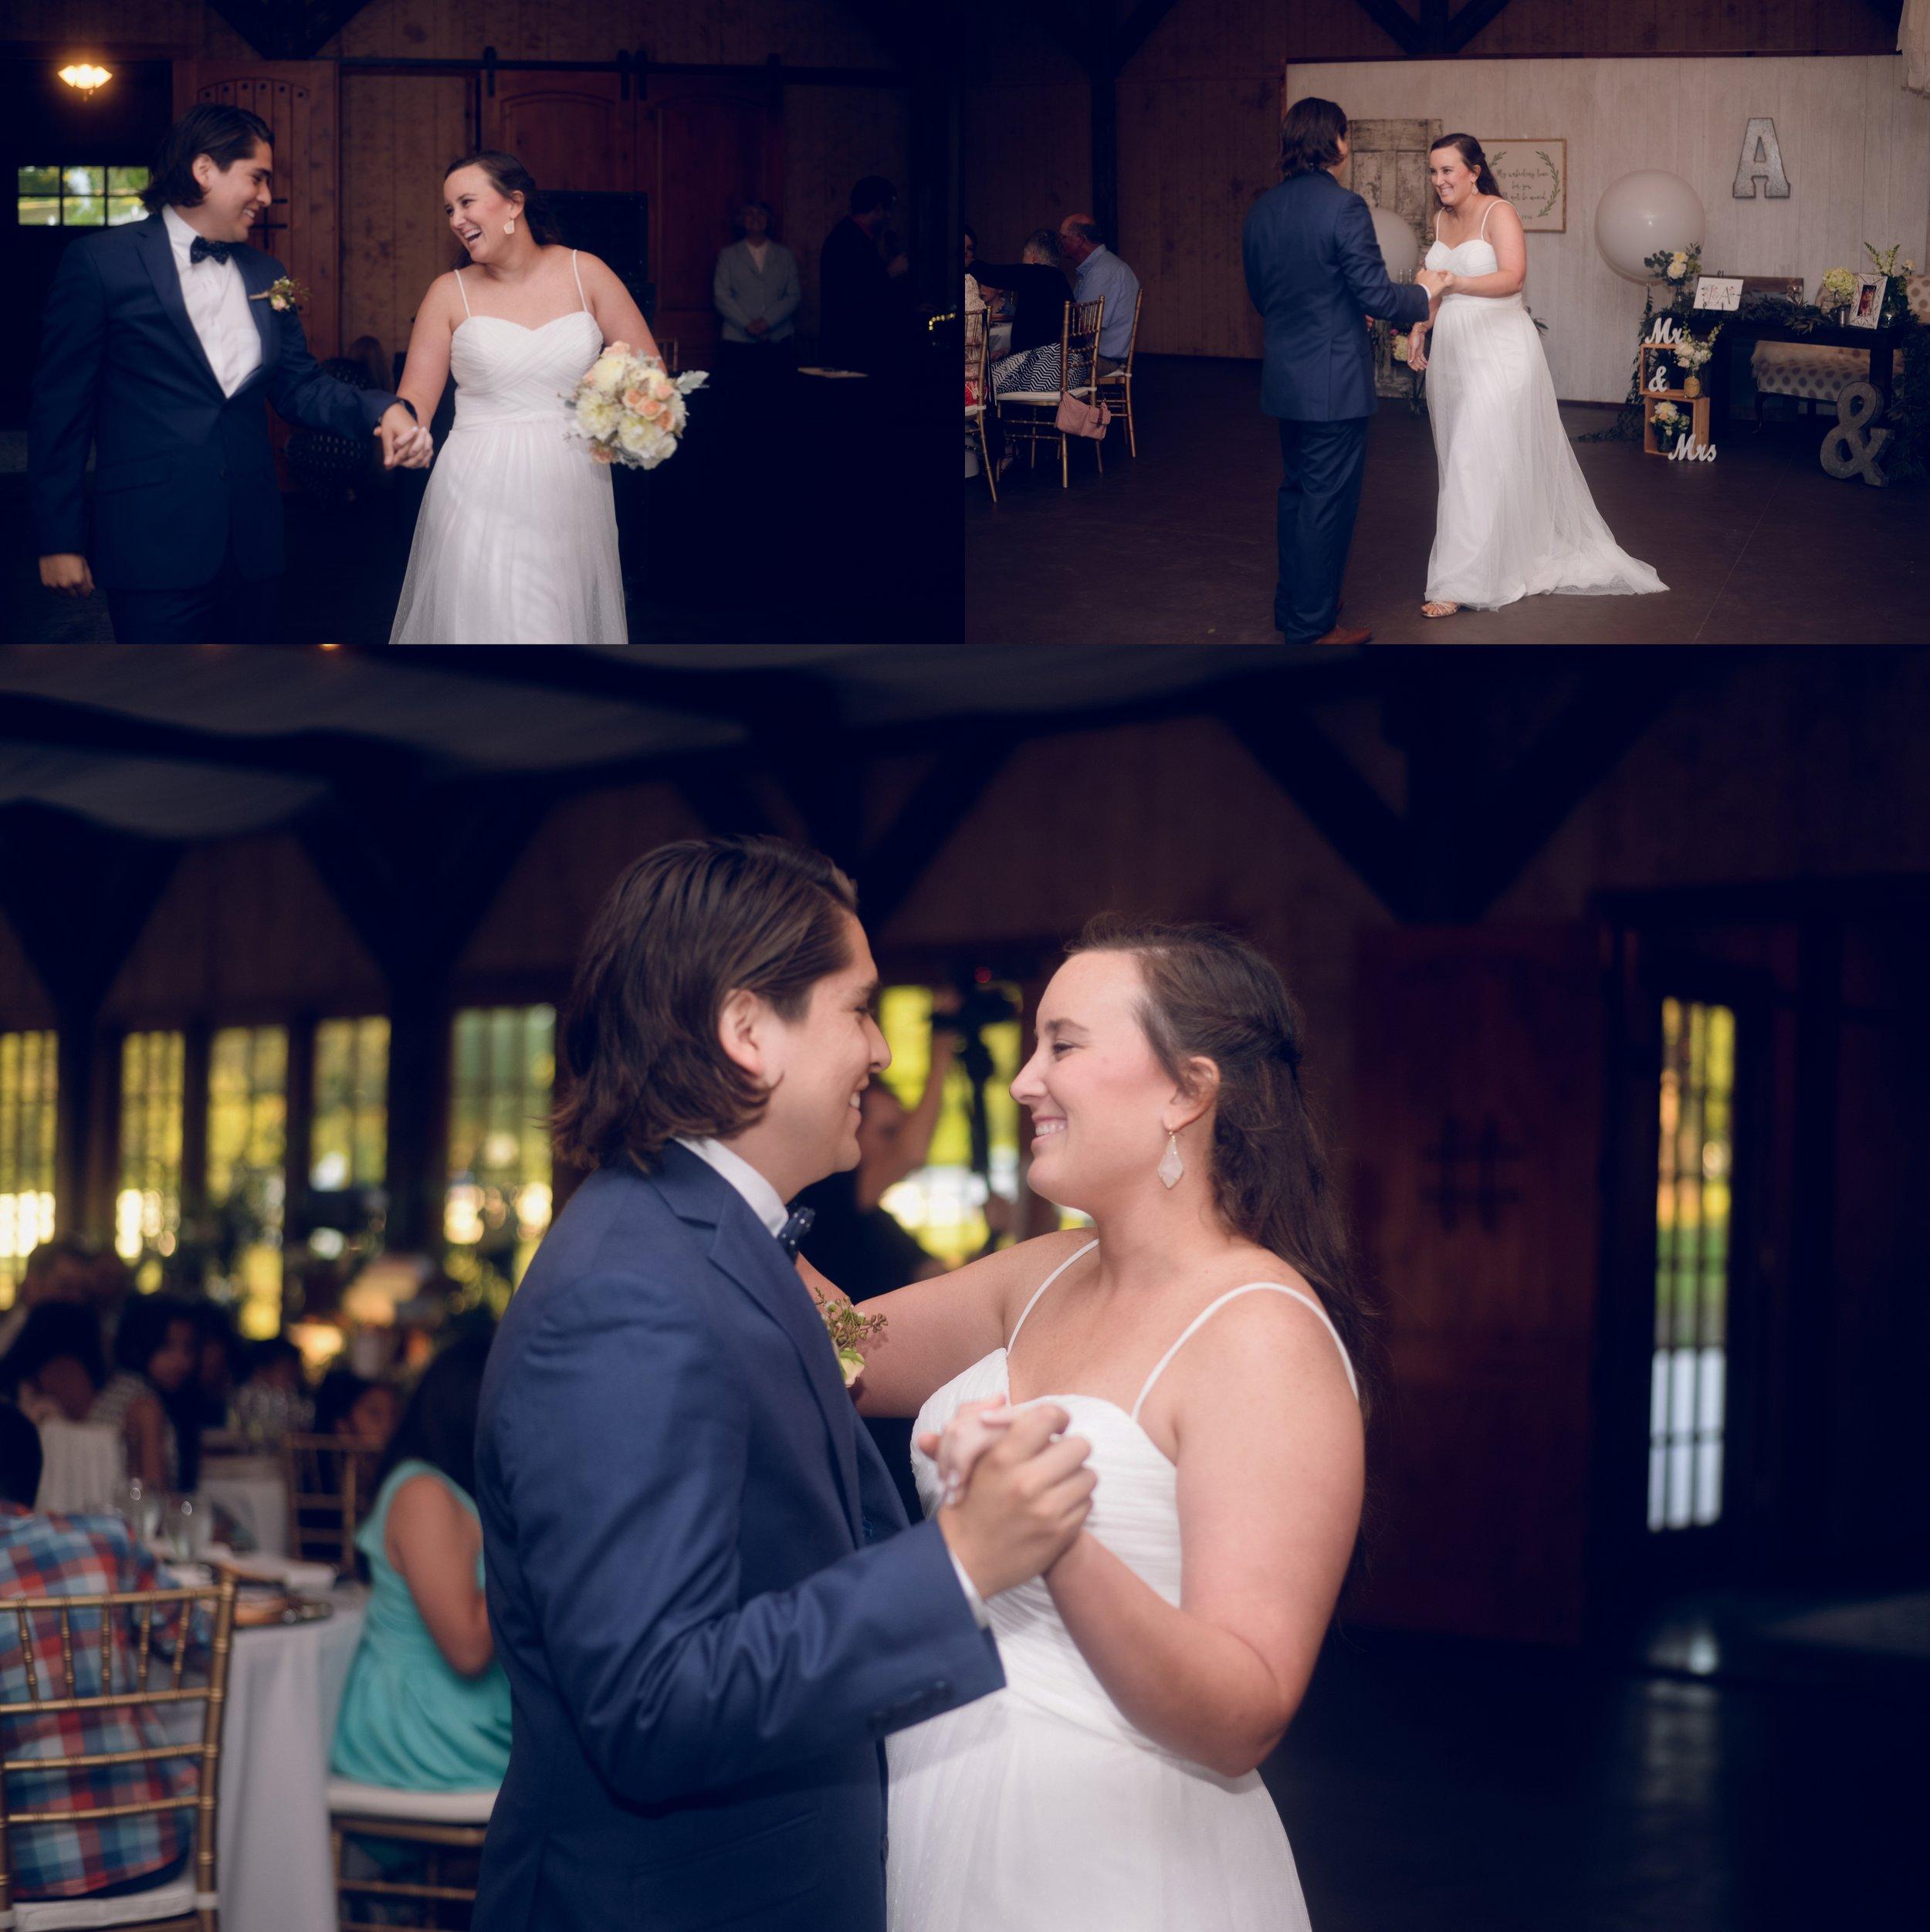 Lonestar-Mansion-Fort-Worth-Wedding-Planner-Burleson-Wedding-Venue_37.jpg